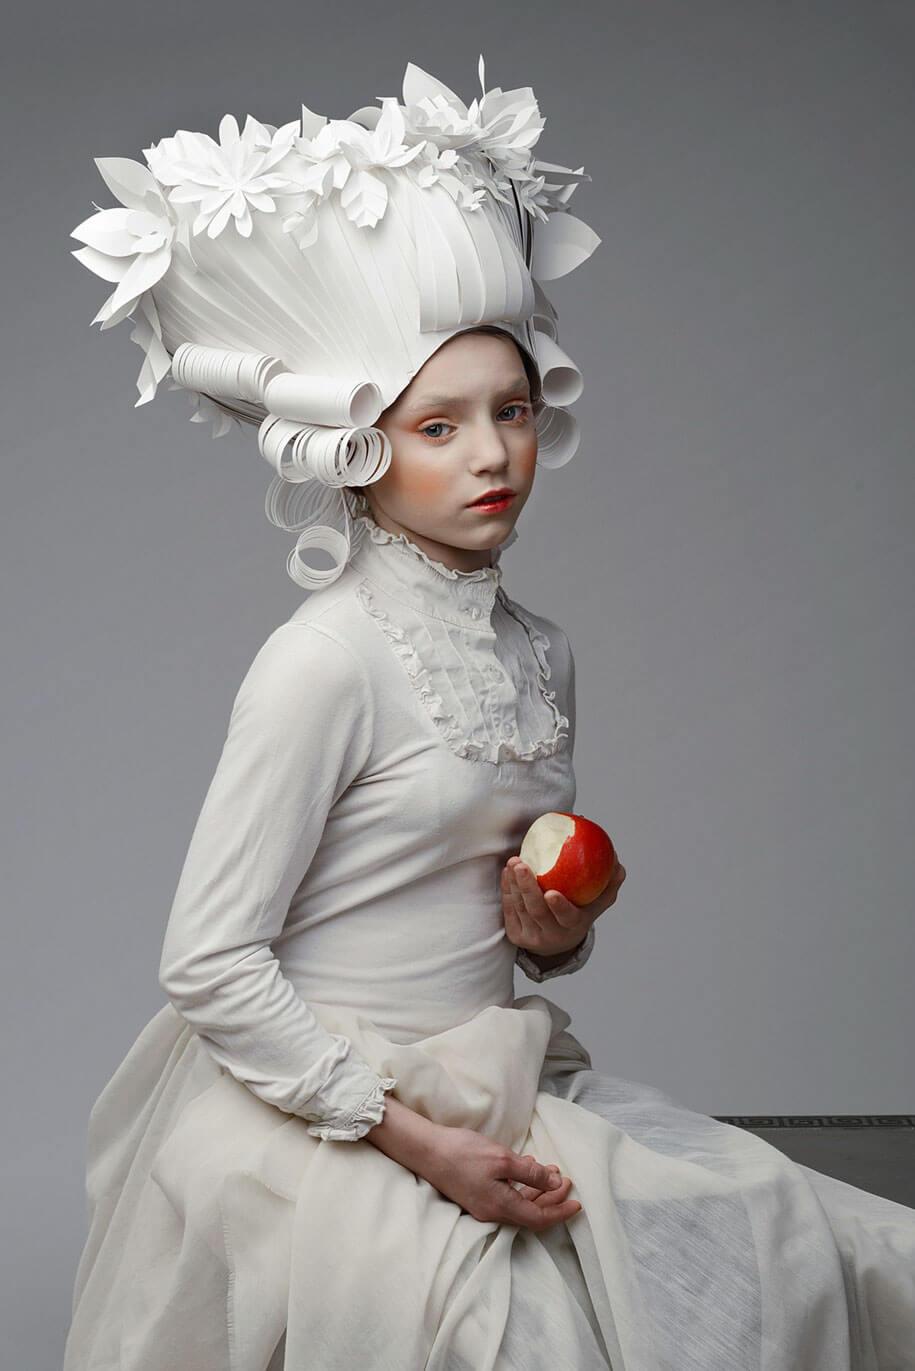 paper-wigs-azya-kozina-fy-13